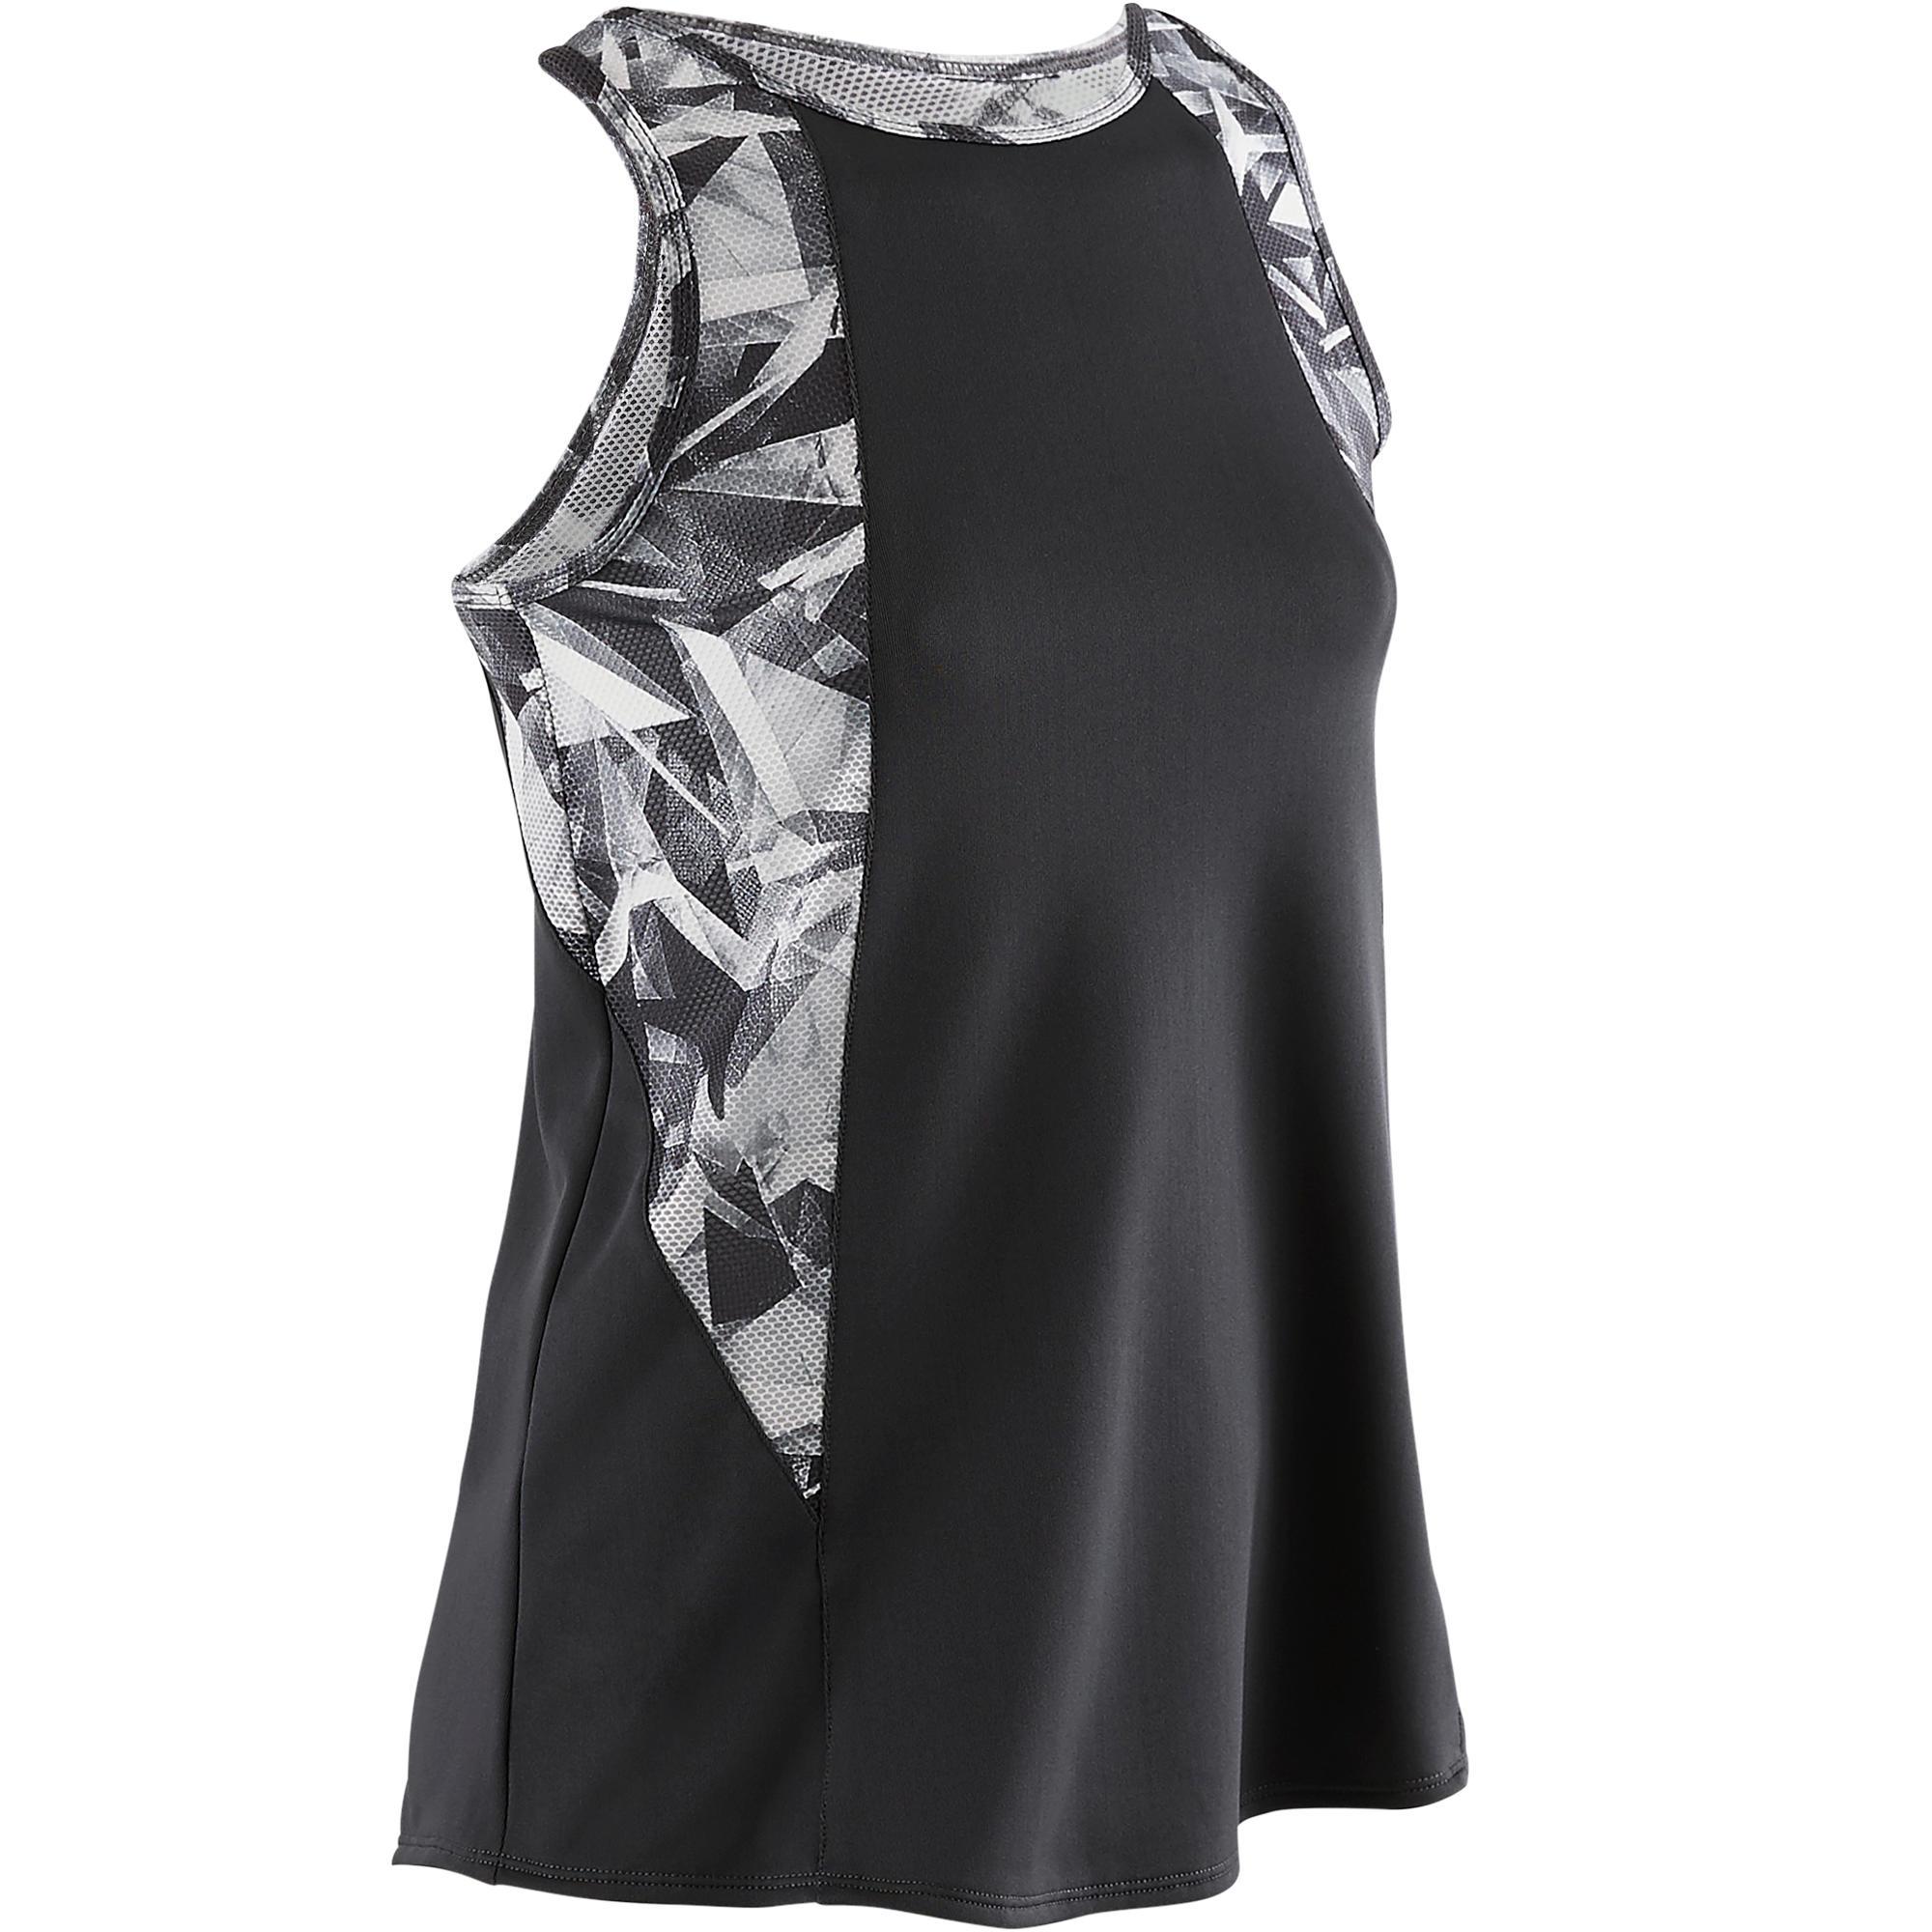 S900 Girls' Gym Tank Top - Grey Print